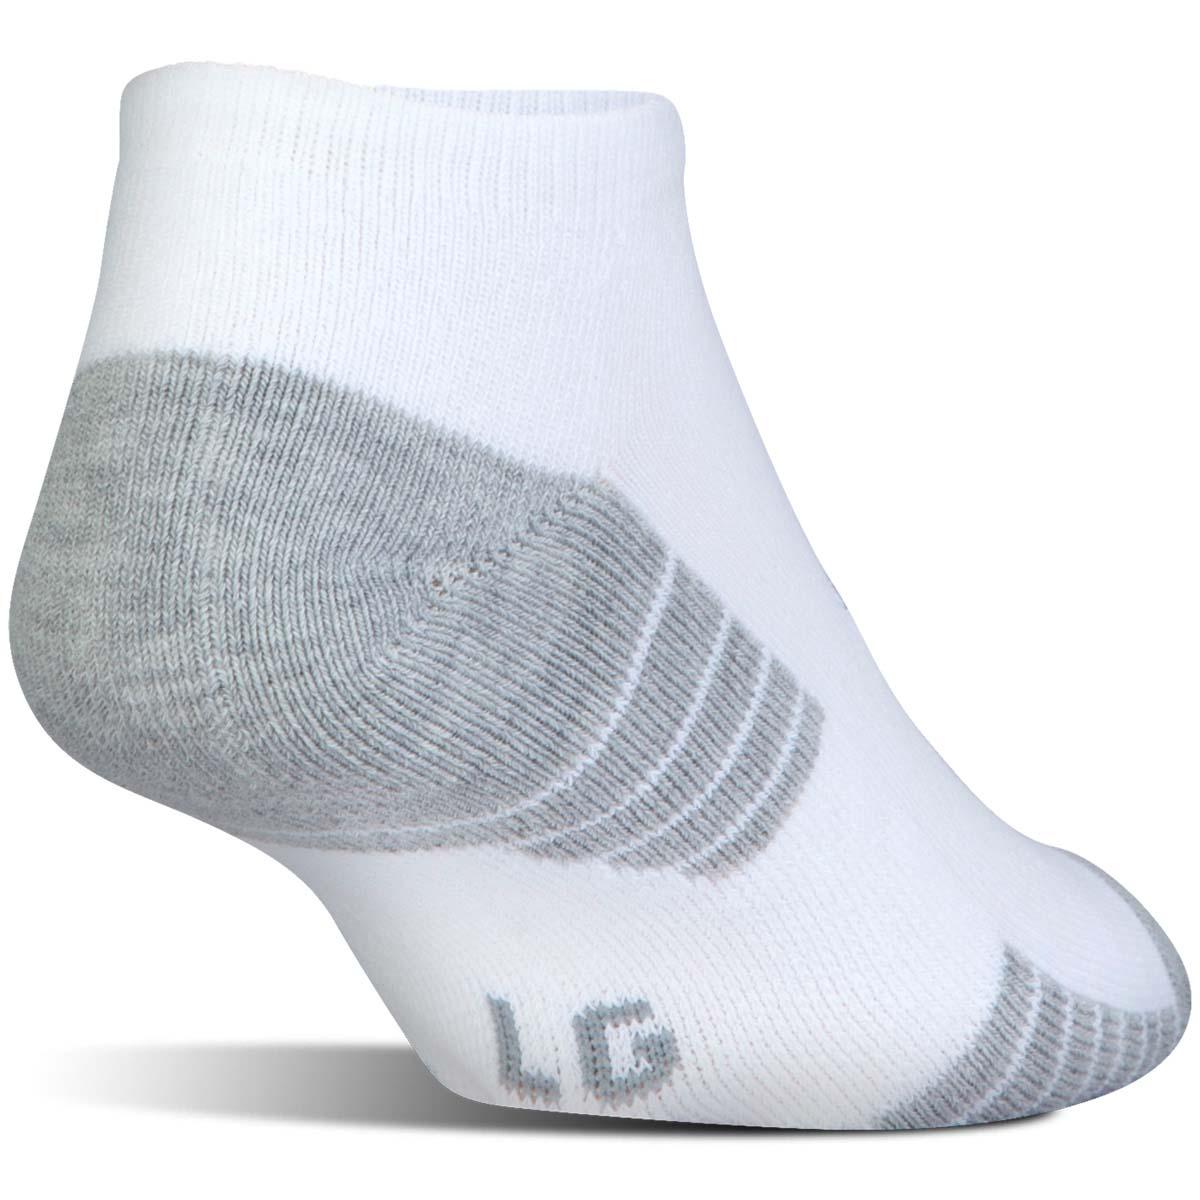 Under-Armour-Unisex-2019-UA-Heatgear-Tech-No-Show-Cushioned-Ventilated-Socks